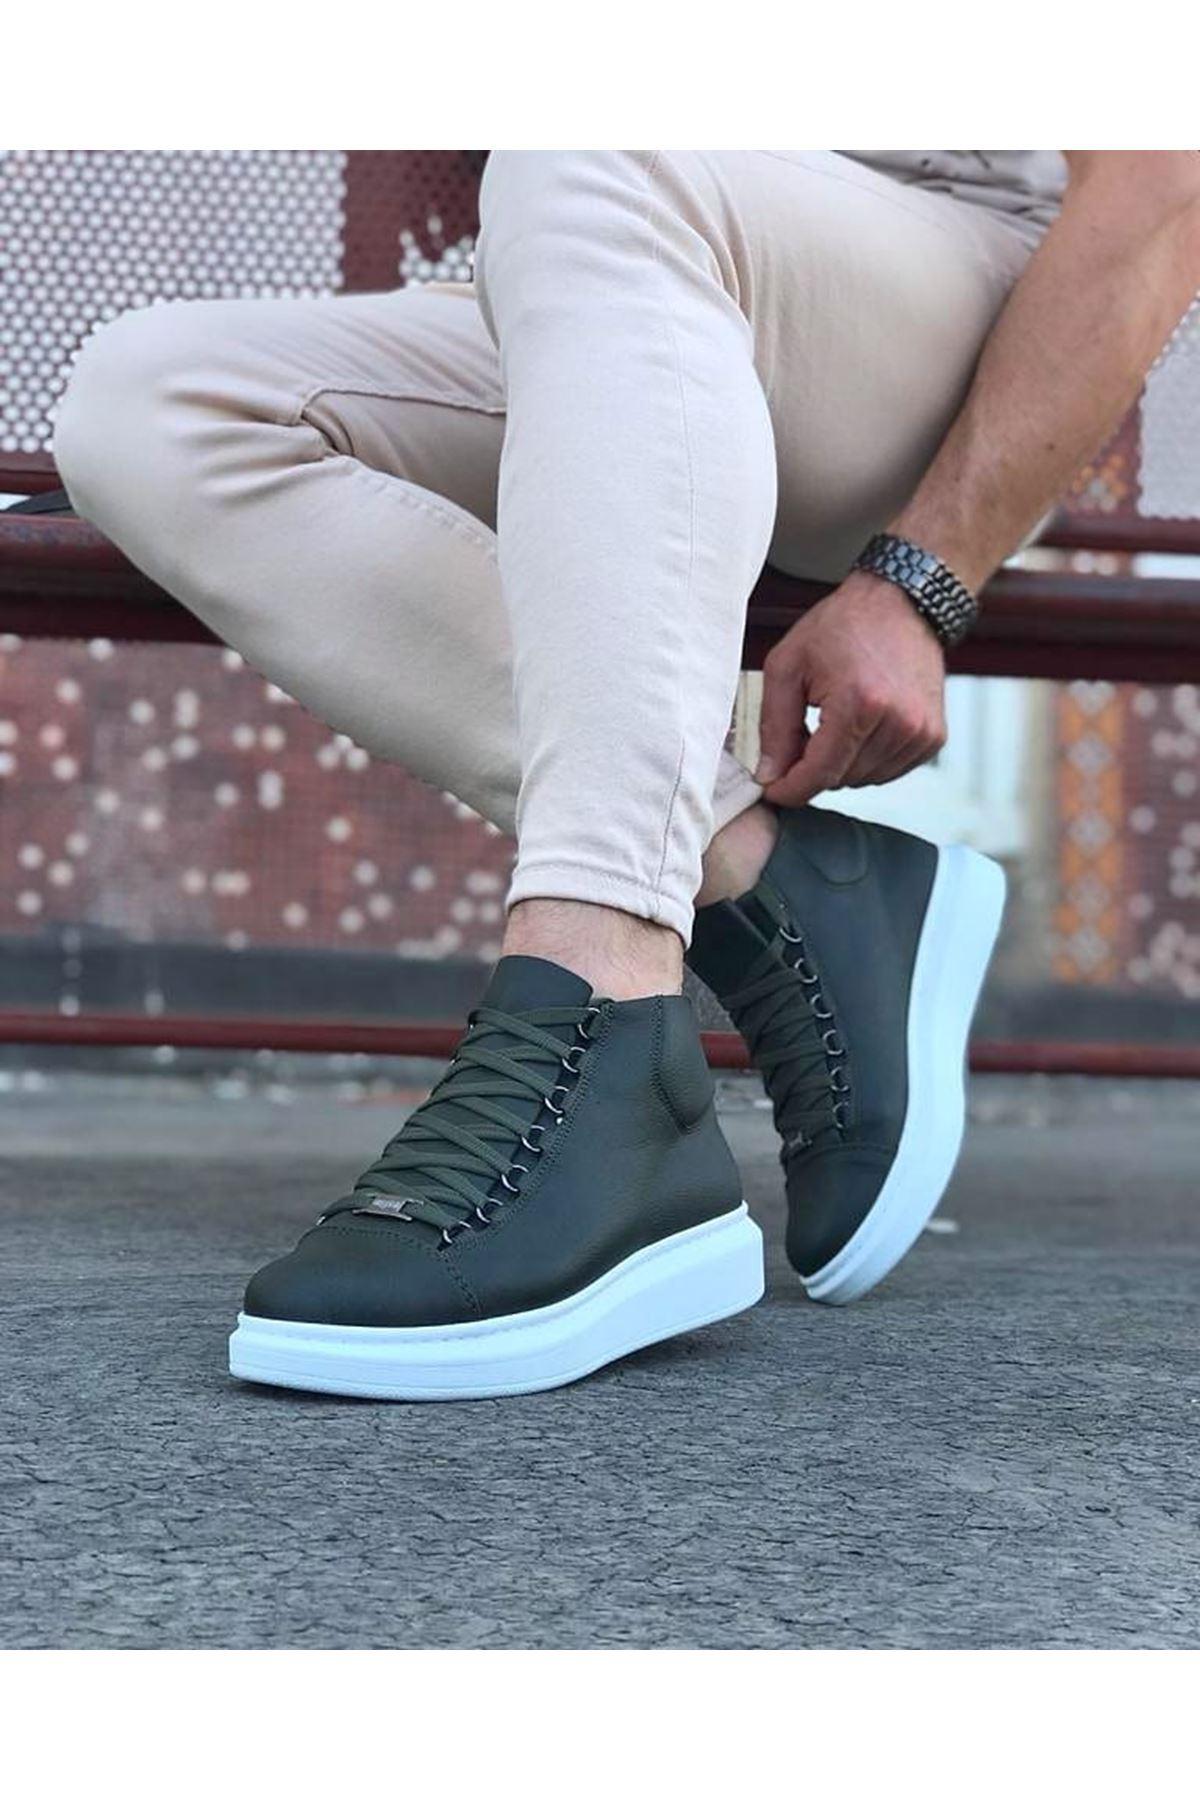 Wagoon WG032 Haki Bağcıklı Sneakers  Yarım Bilek Bot